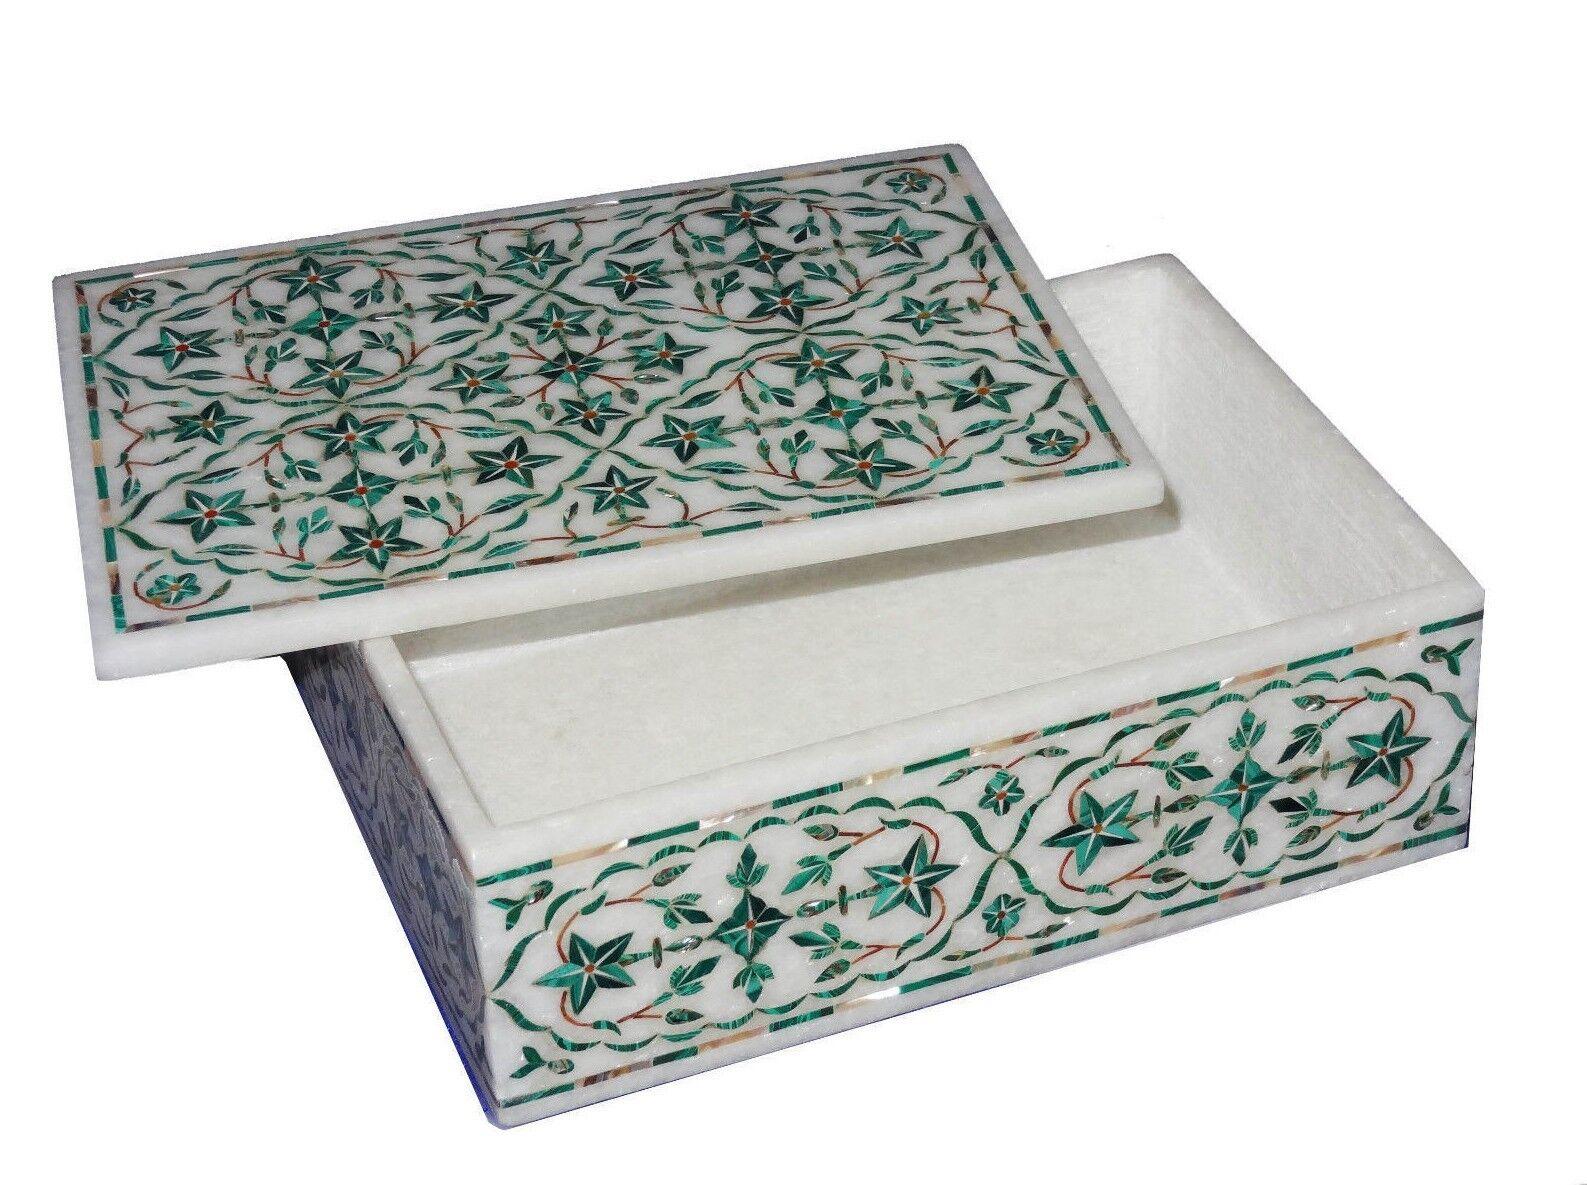 Marble Box Semi Precious Stones art Inlay handicraft Work home decor